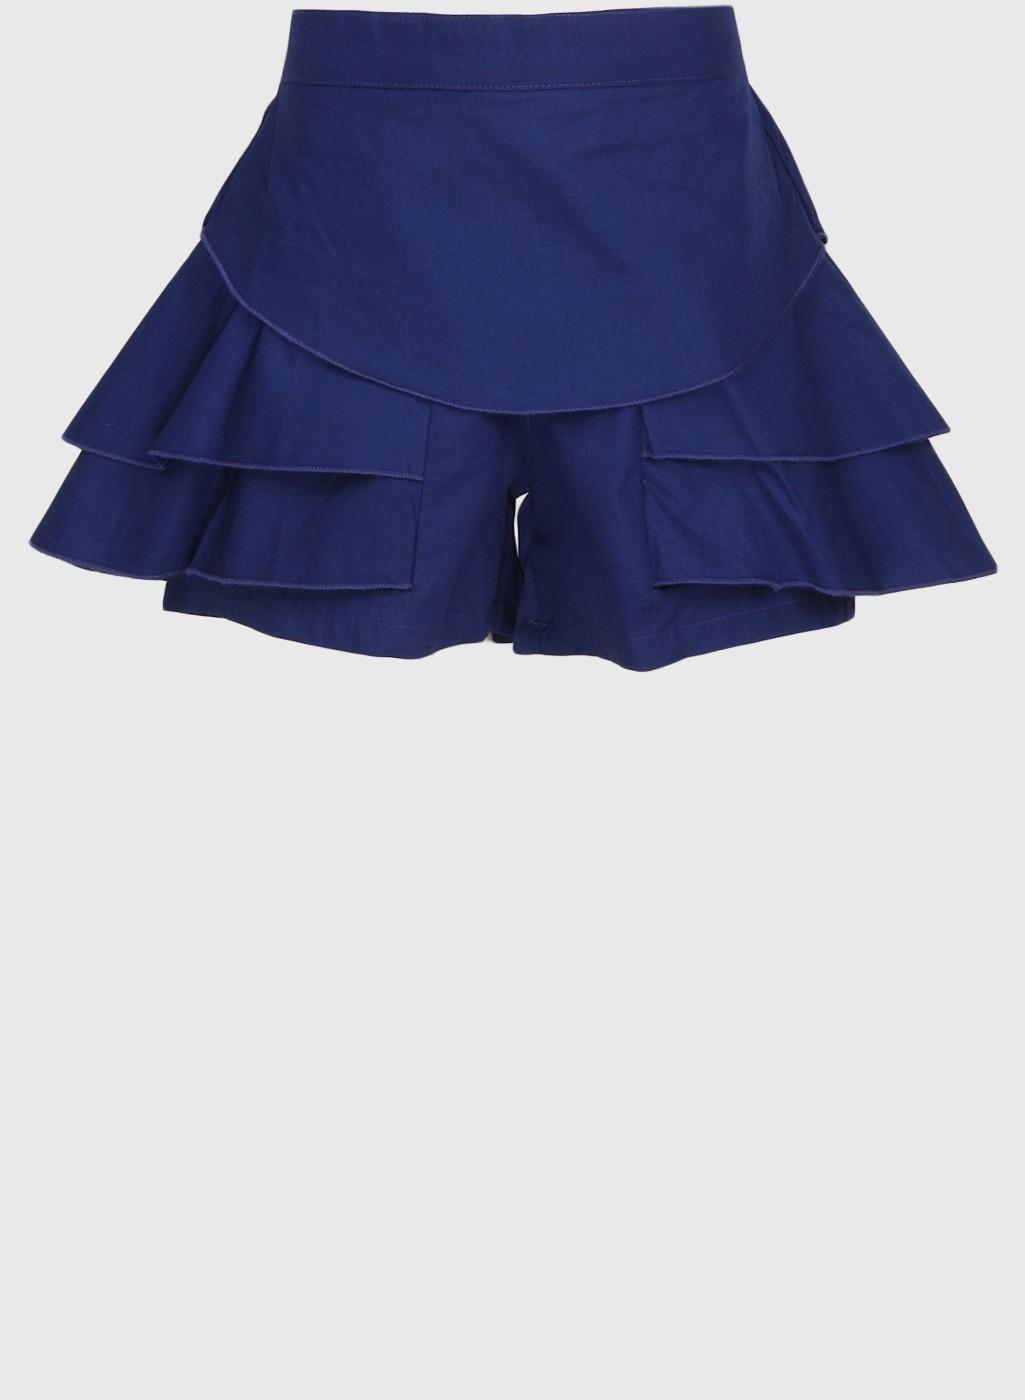 Navy Blue Stylish Regular Fit Cotton Short